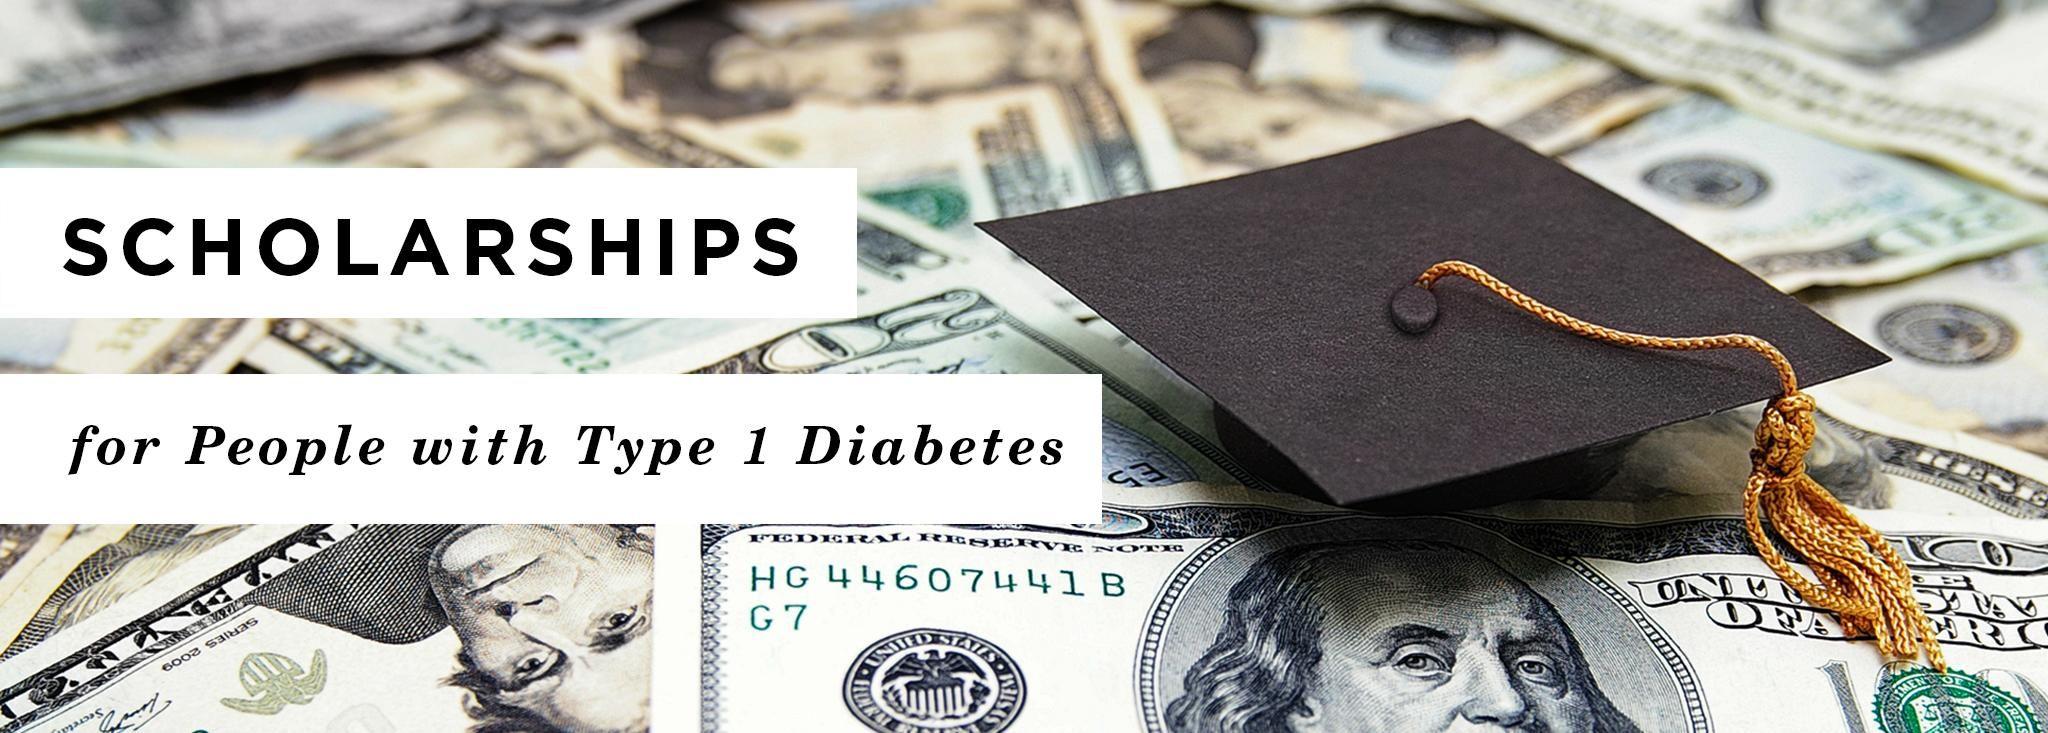 College Athletes With Type 1 Diabetes